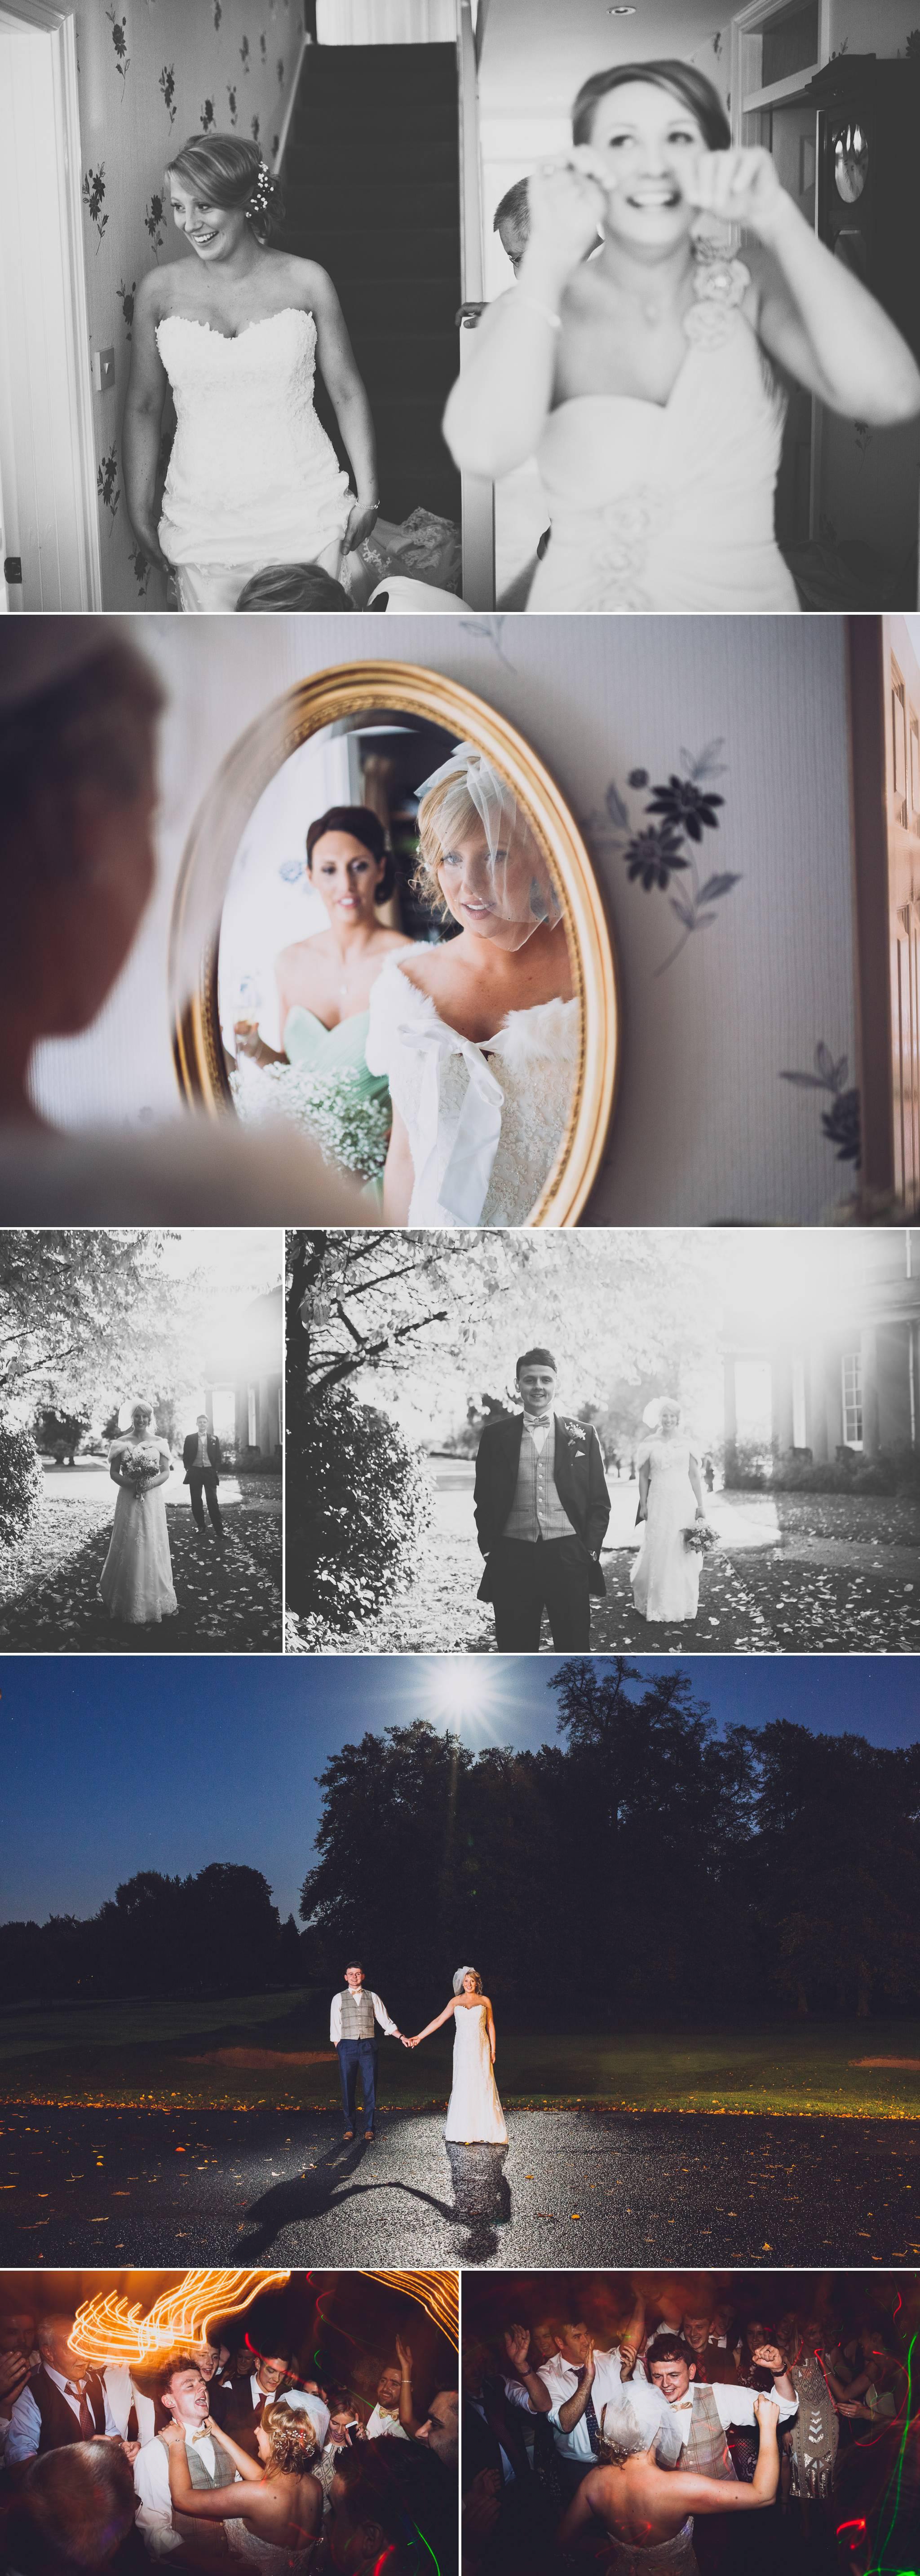 staffordshire-wedding-photographer 43.jpg